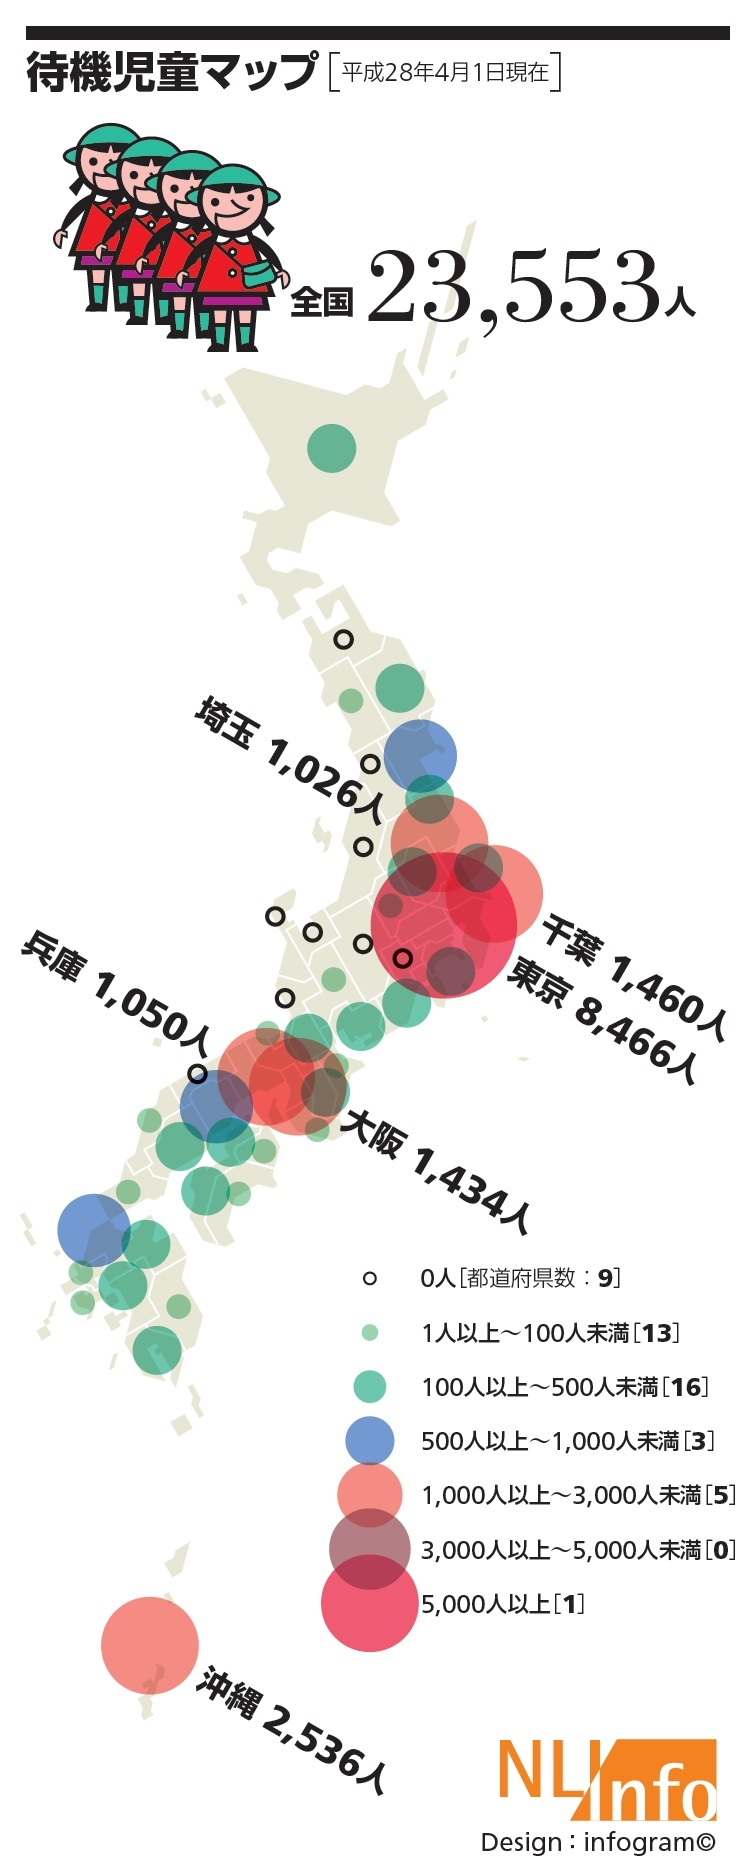 待機児童マップ[平成28年4月1日現在]